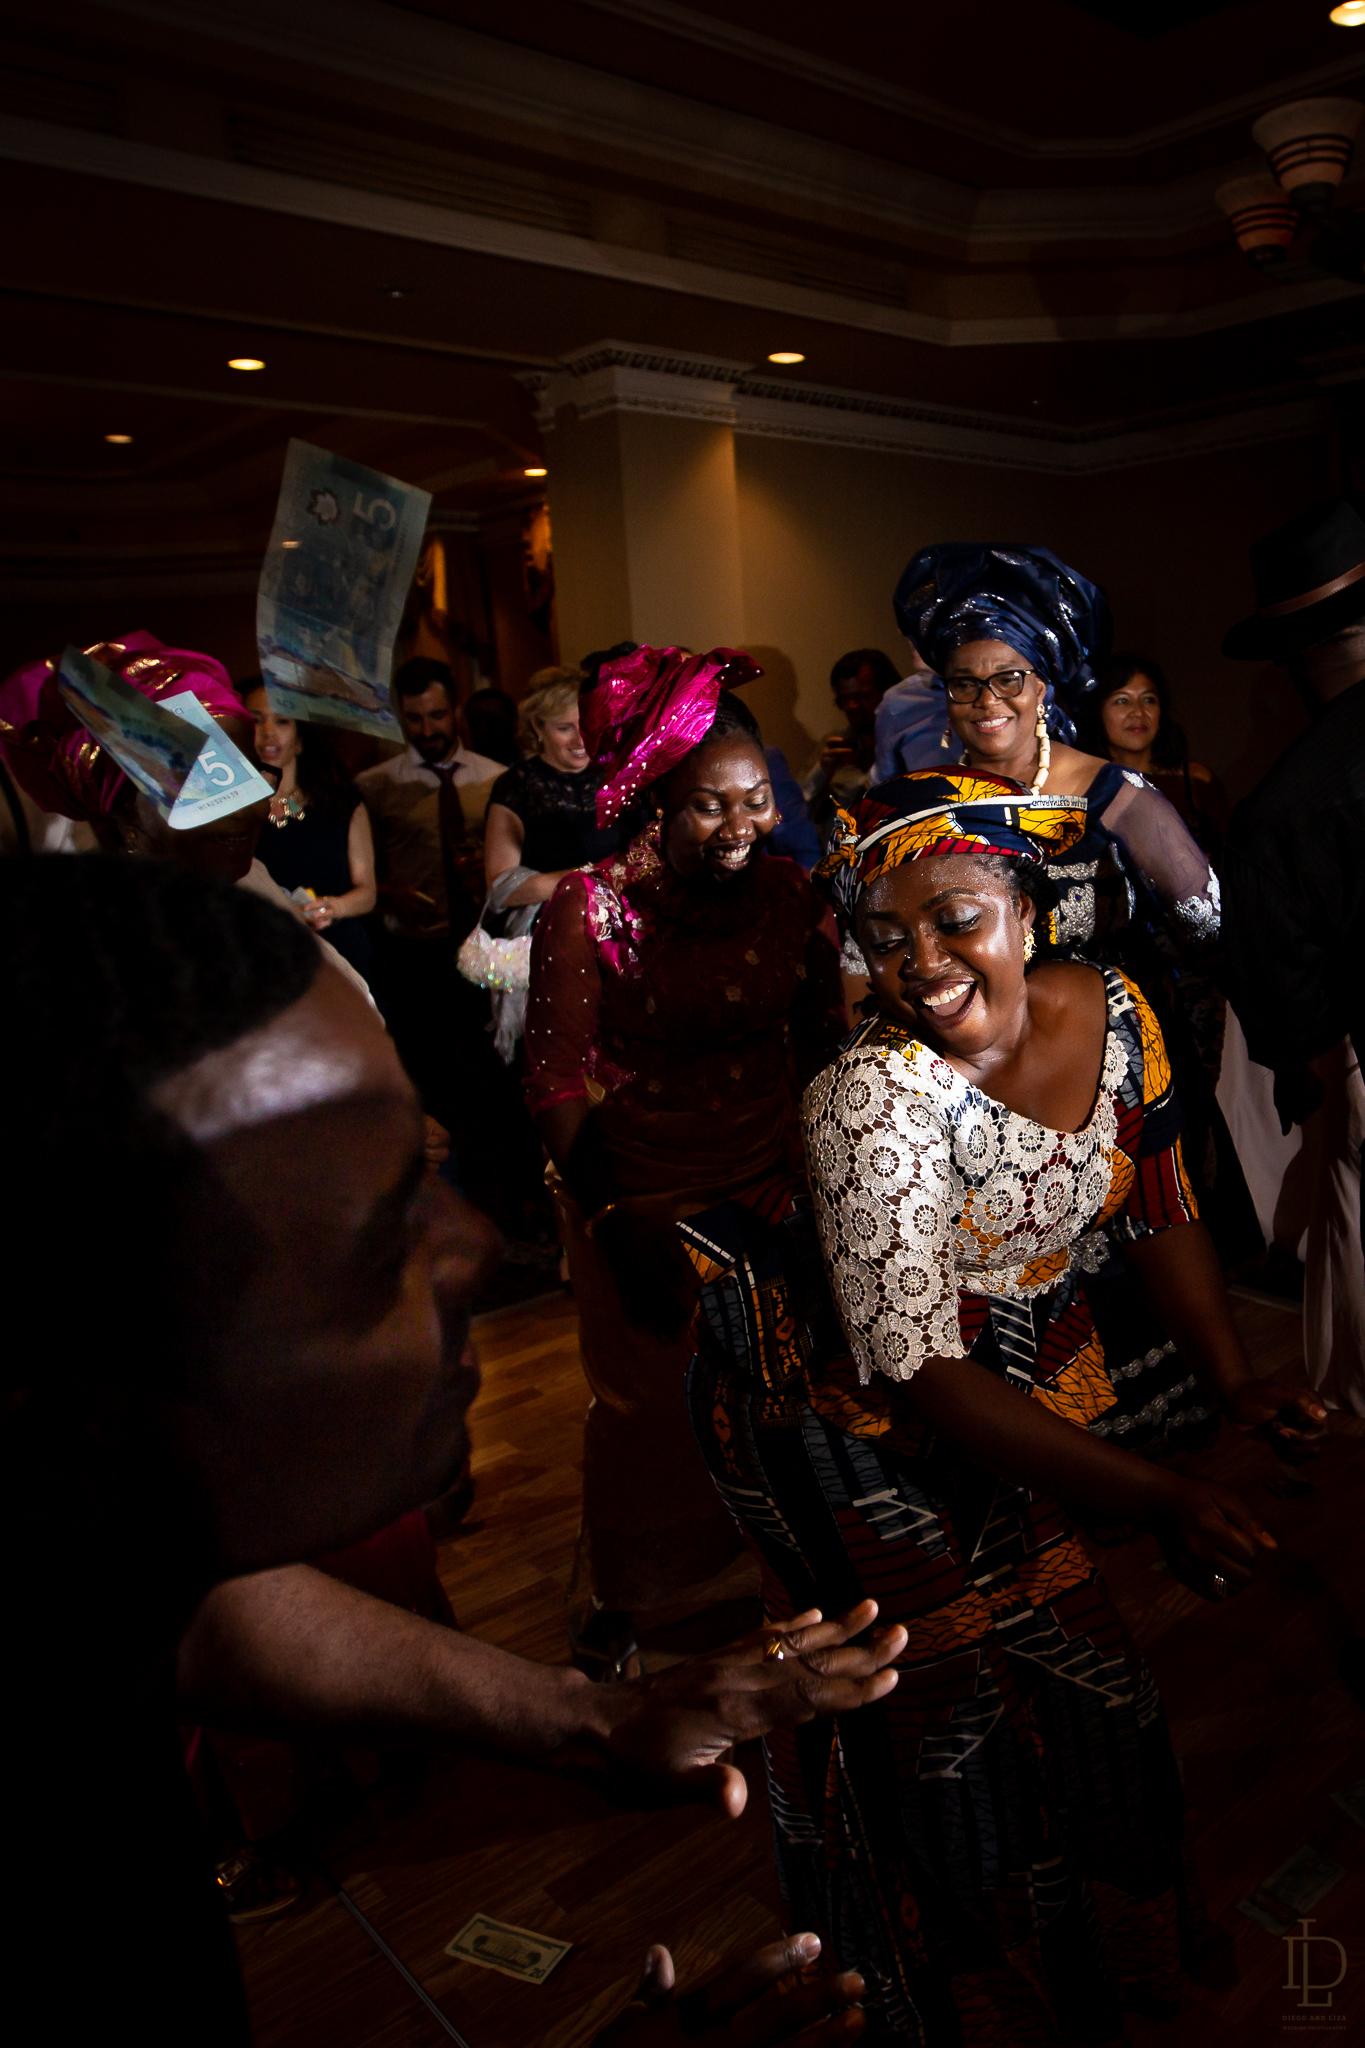 toronto-wedding-photograper-56.jpg